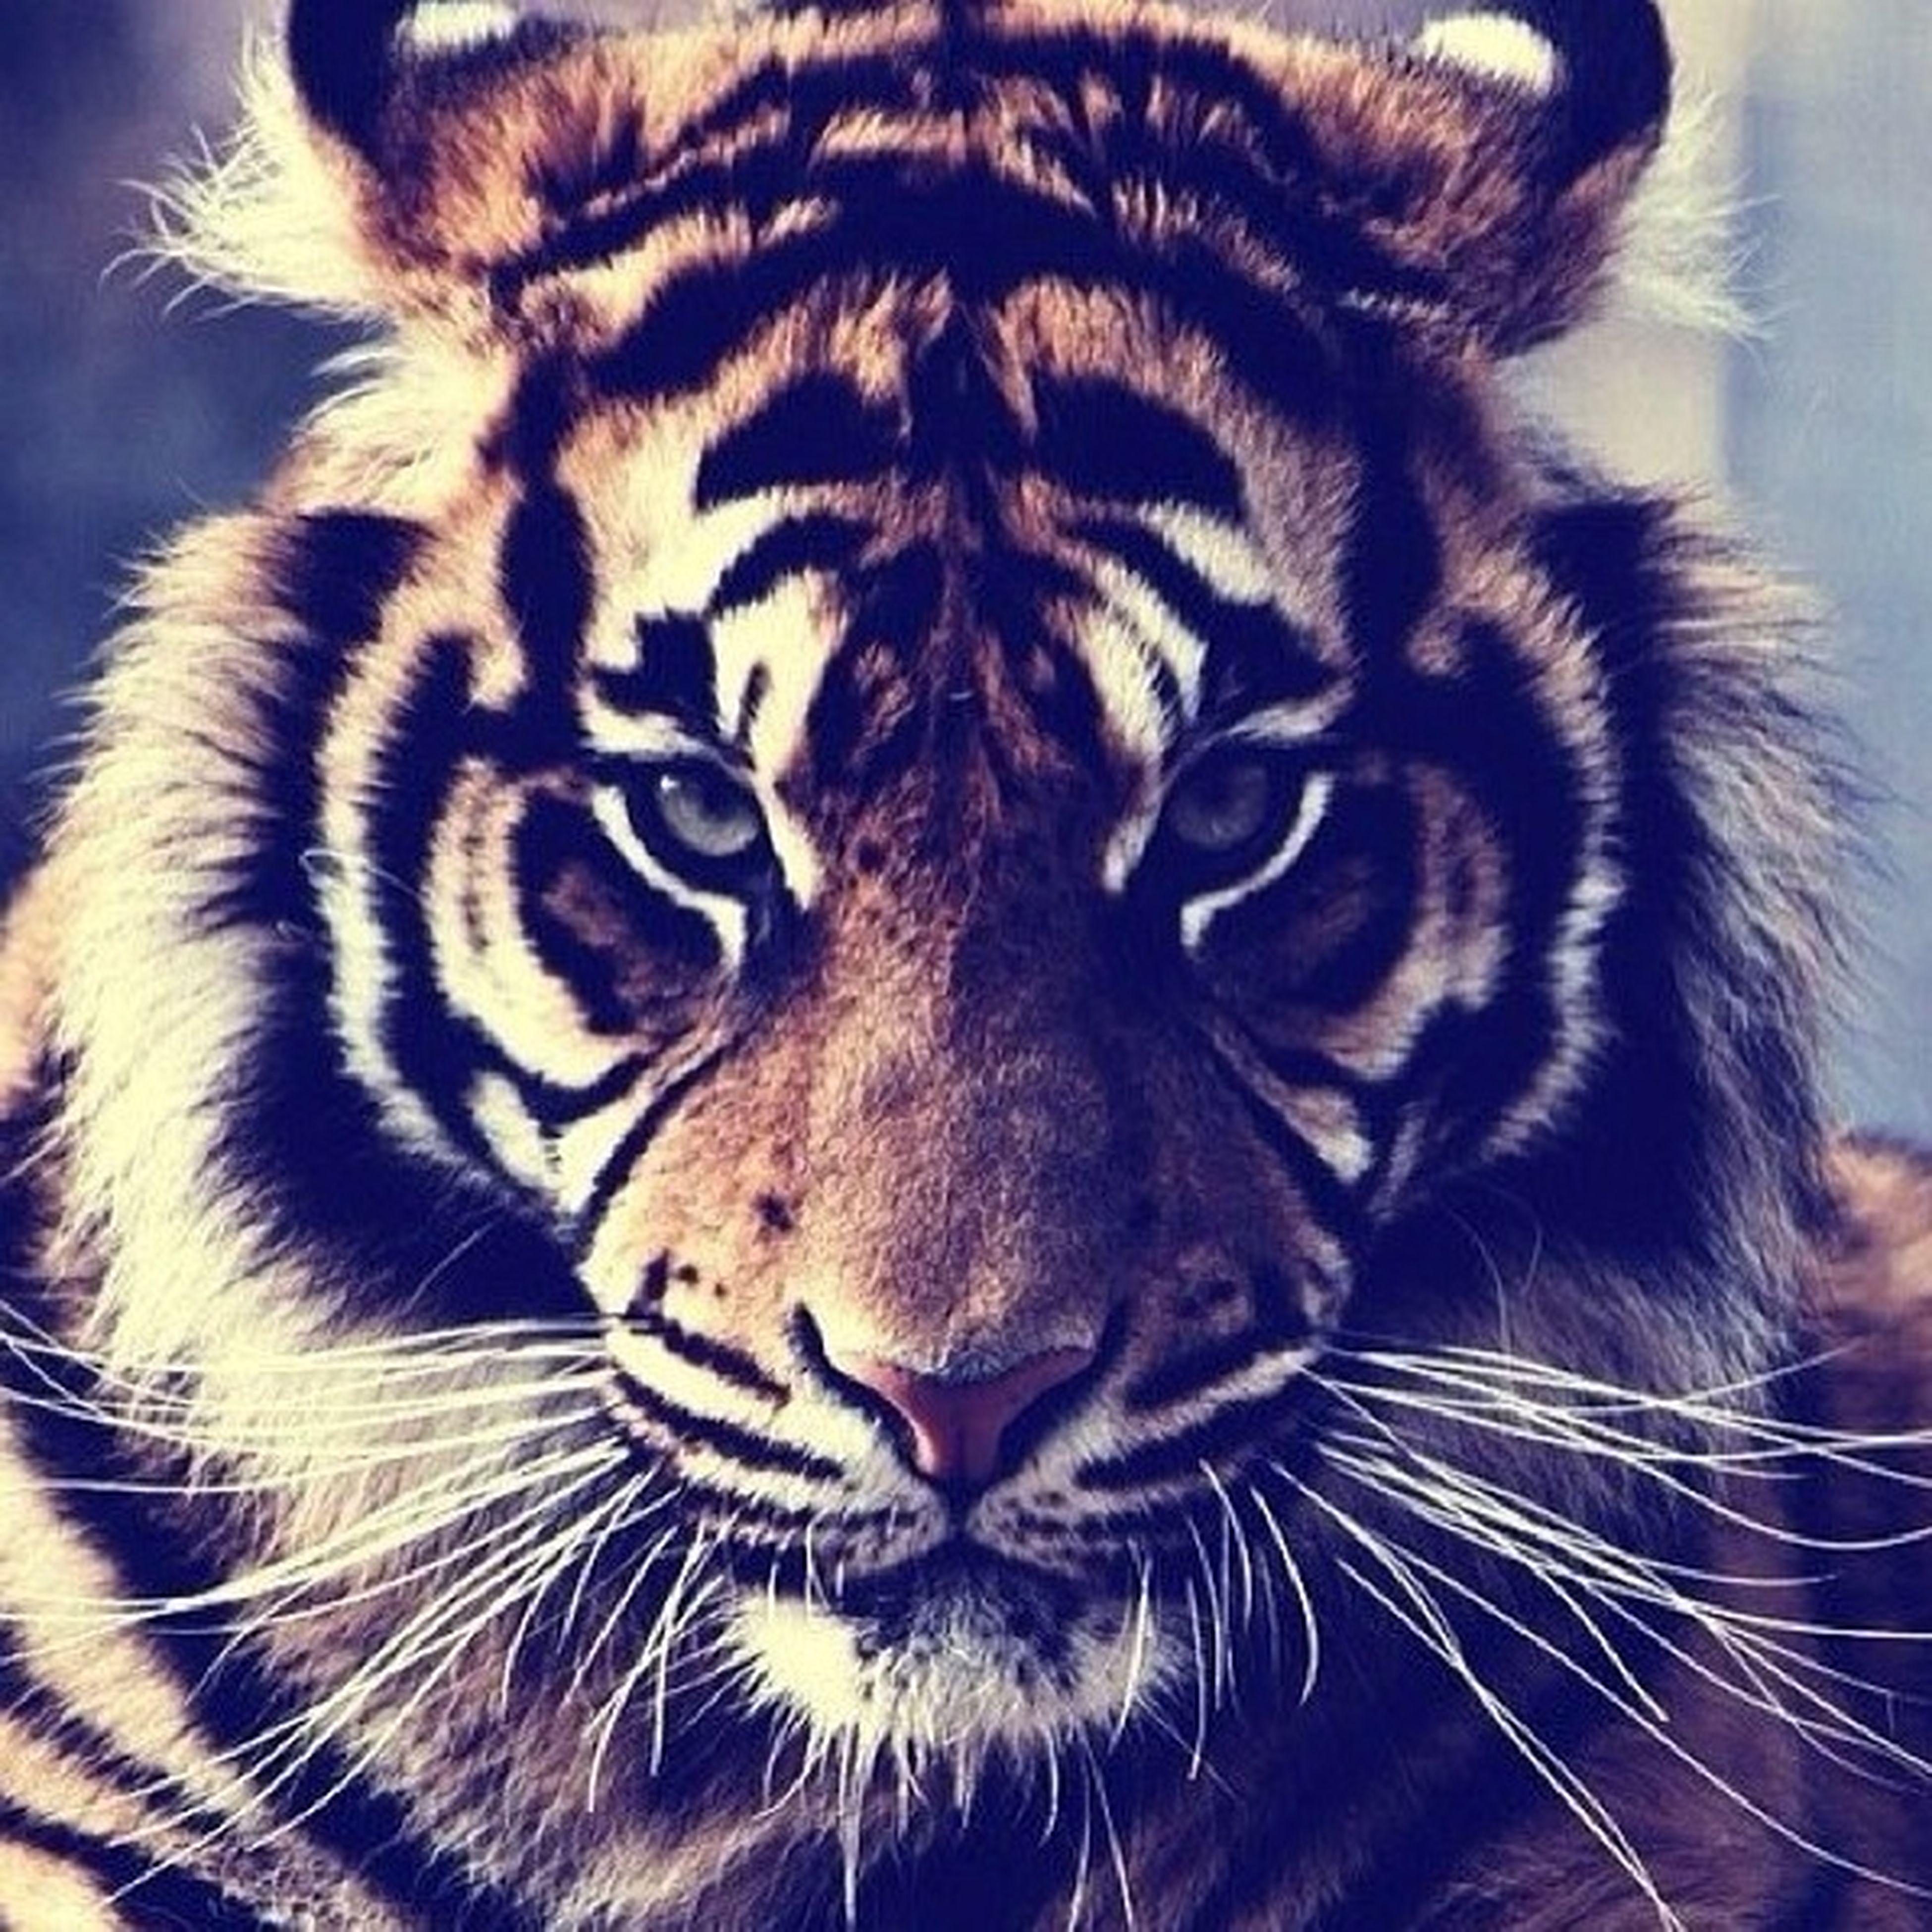 animal themes, one animal, mammal, animal markings, wildlife, animal head, close-up, animals in the wild, tiger, safari animals, animal body part, whisker, domestic animals, natural pattern, feline, carnivora, big cat, no people, portrait, zoology